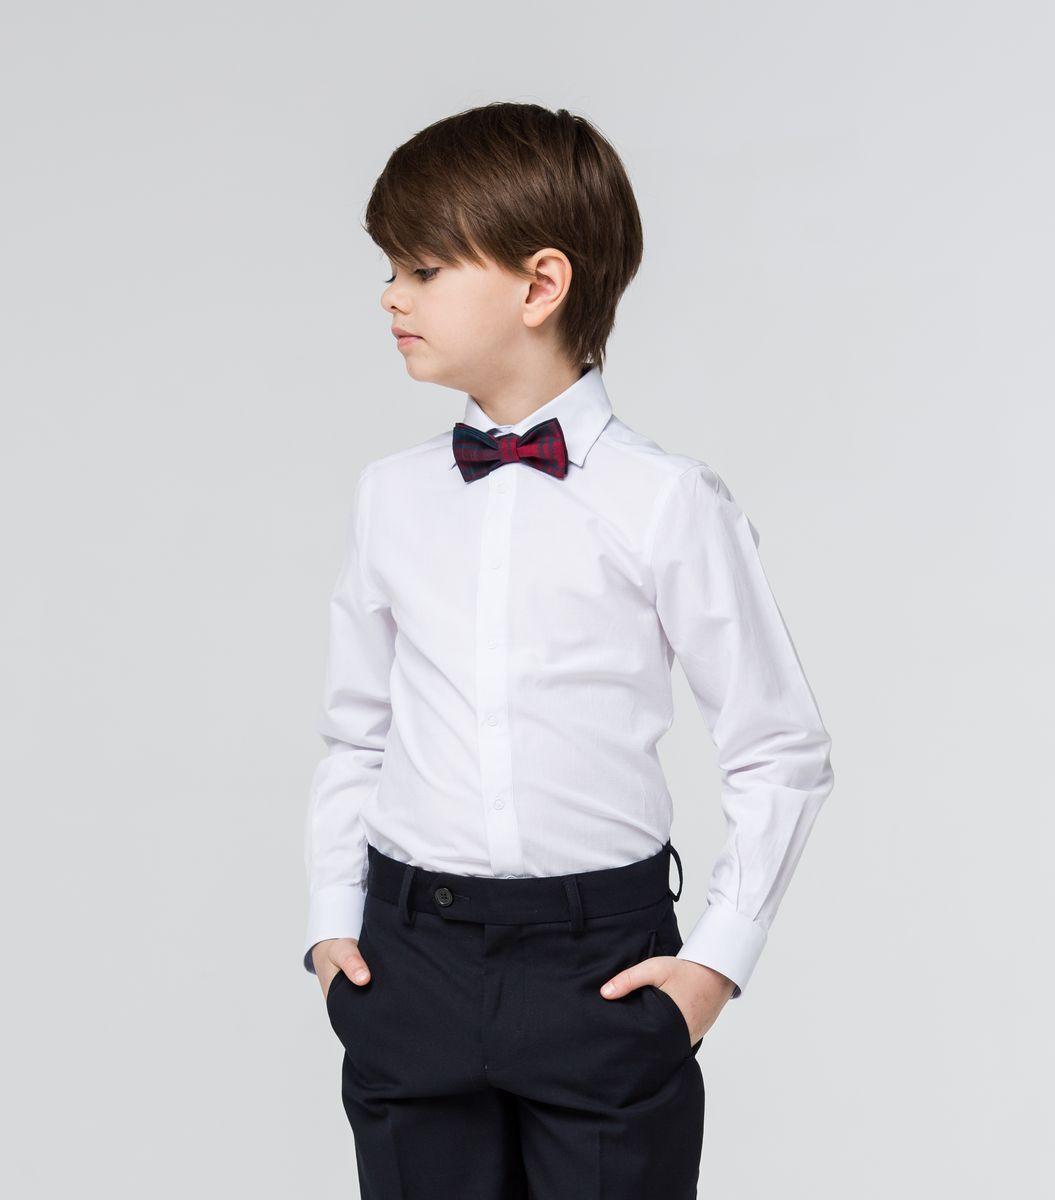 Рубашка для мальчика Silver Spoon, цвет: белый, светло-голубой. SSFSB-629-13831-299. Размер 158